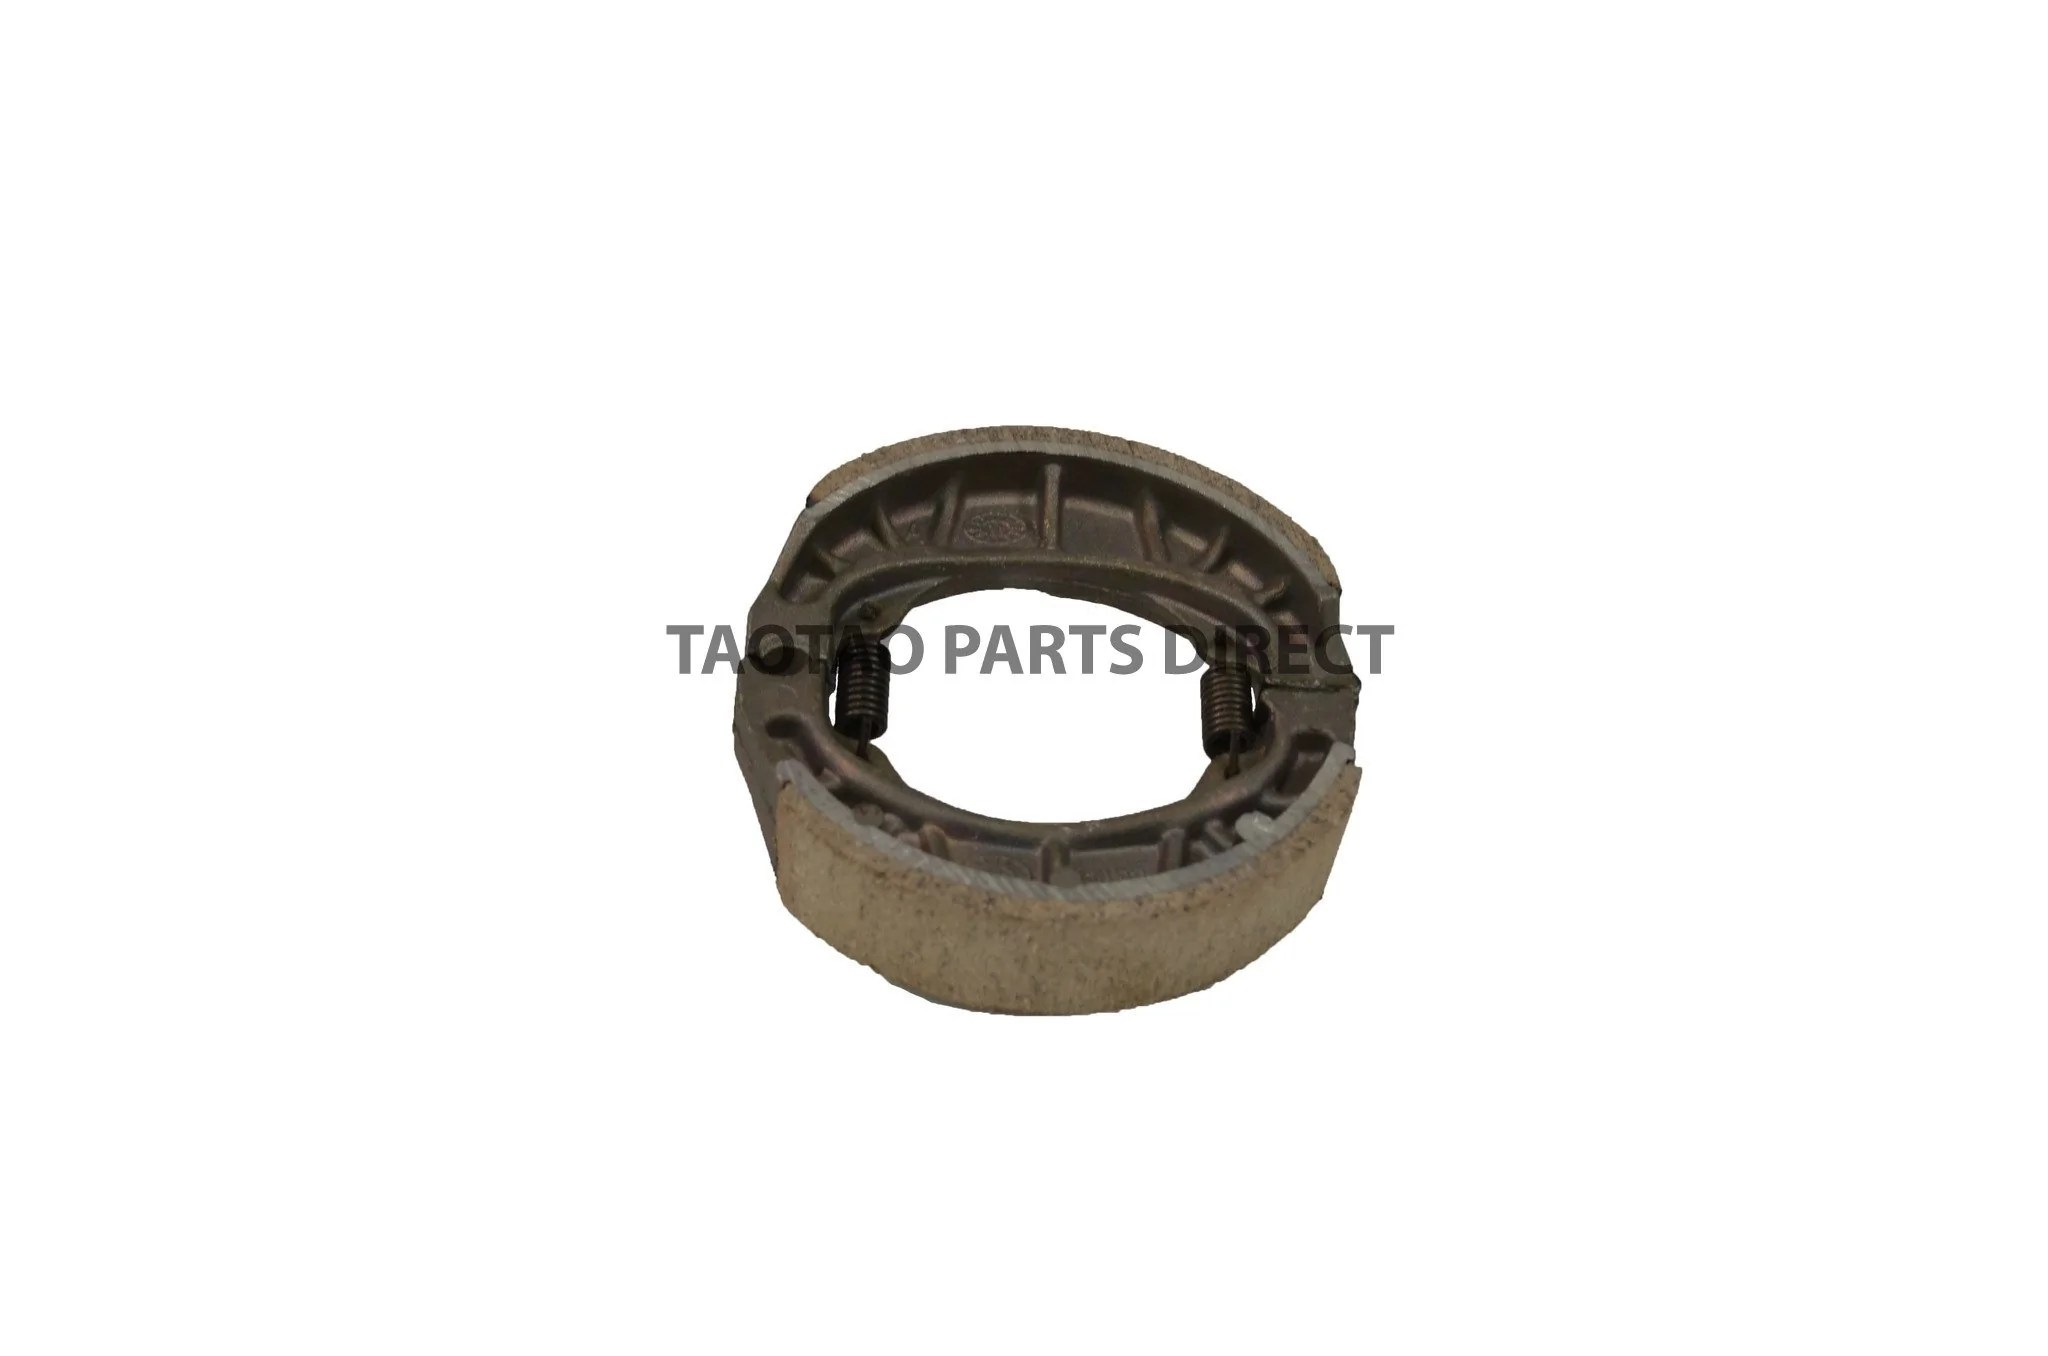 hight resolution of 49cc brake shoes taotaopartsdirect com